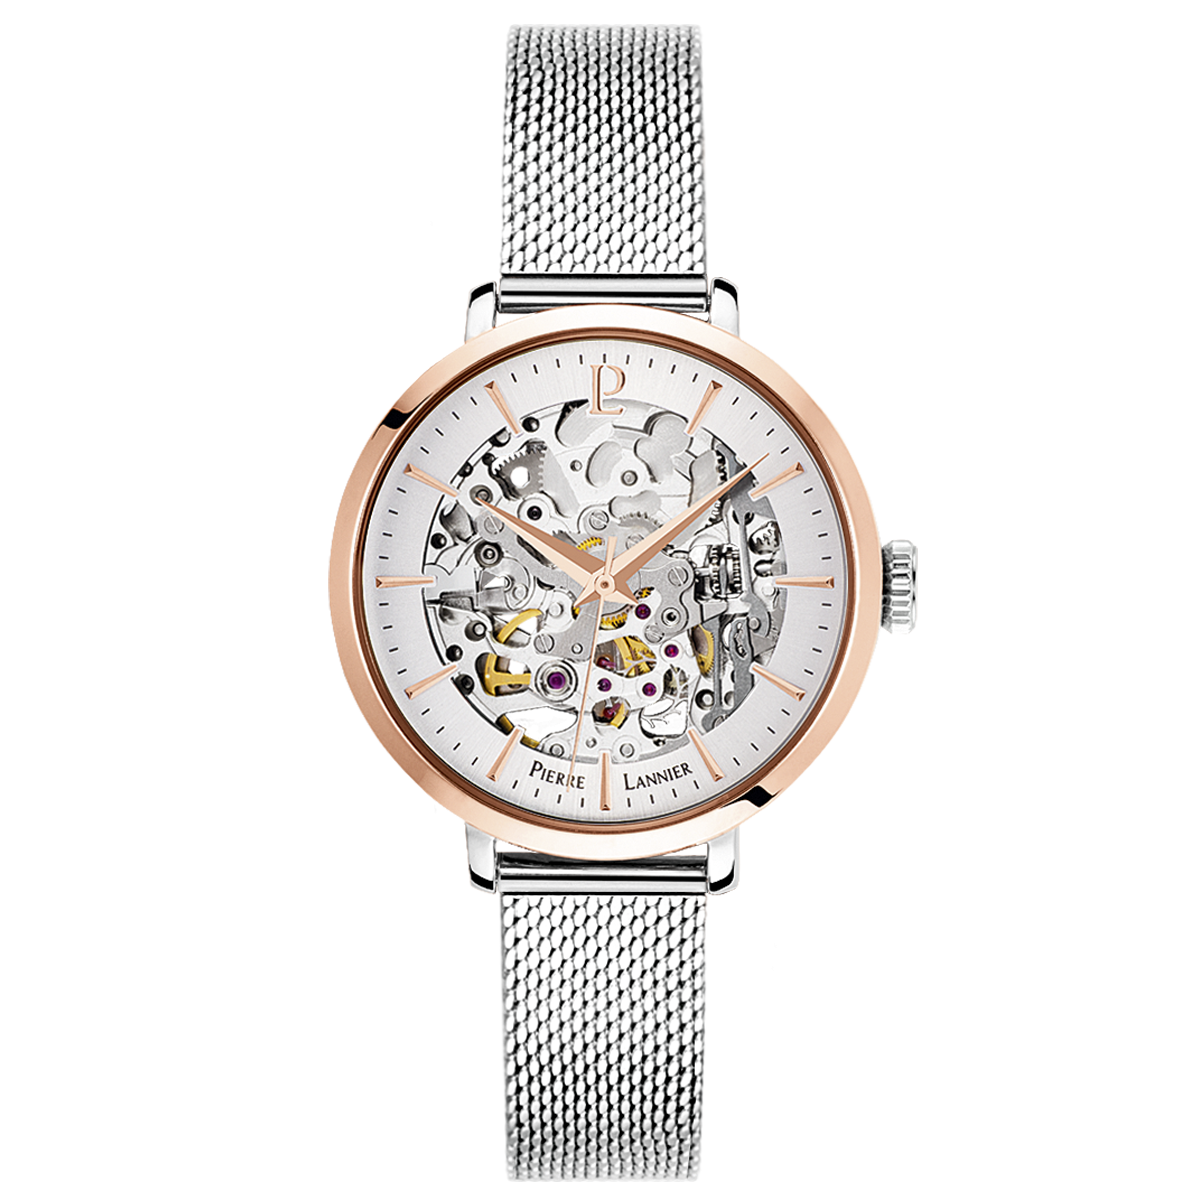 Женские часы Pierre Lannier Automatic 312B628